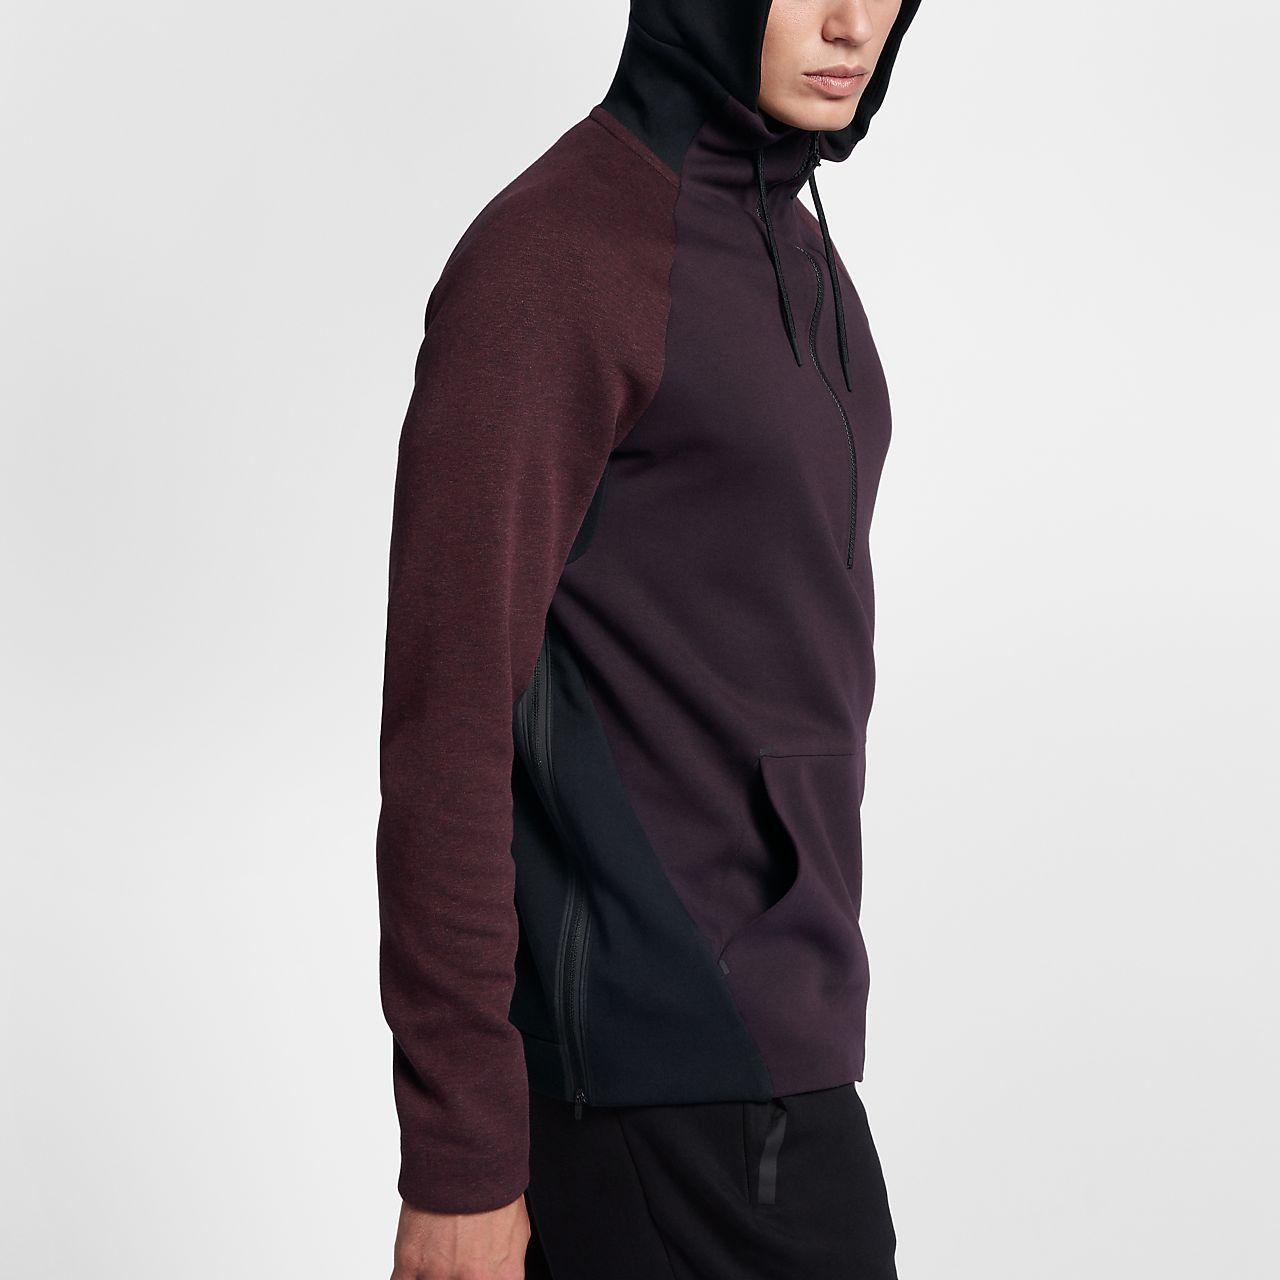 Nike Sportswear Tech Fleece Men s Half-Zip Hoodie. Nike.com NO d54c6cc1cf66